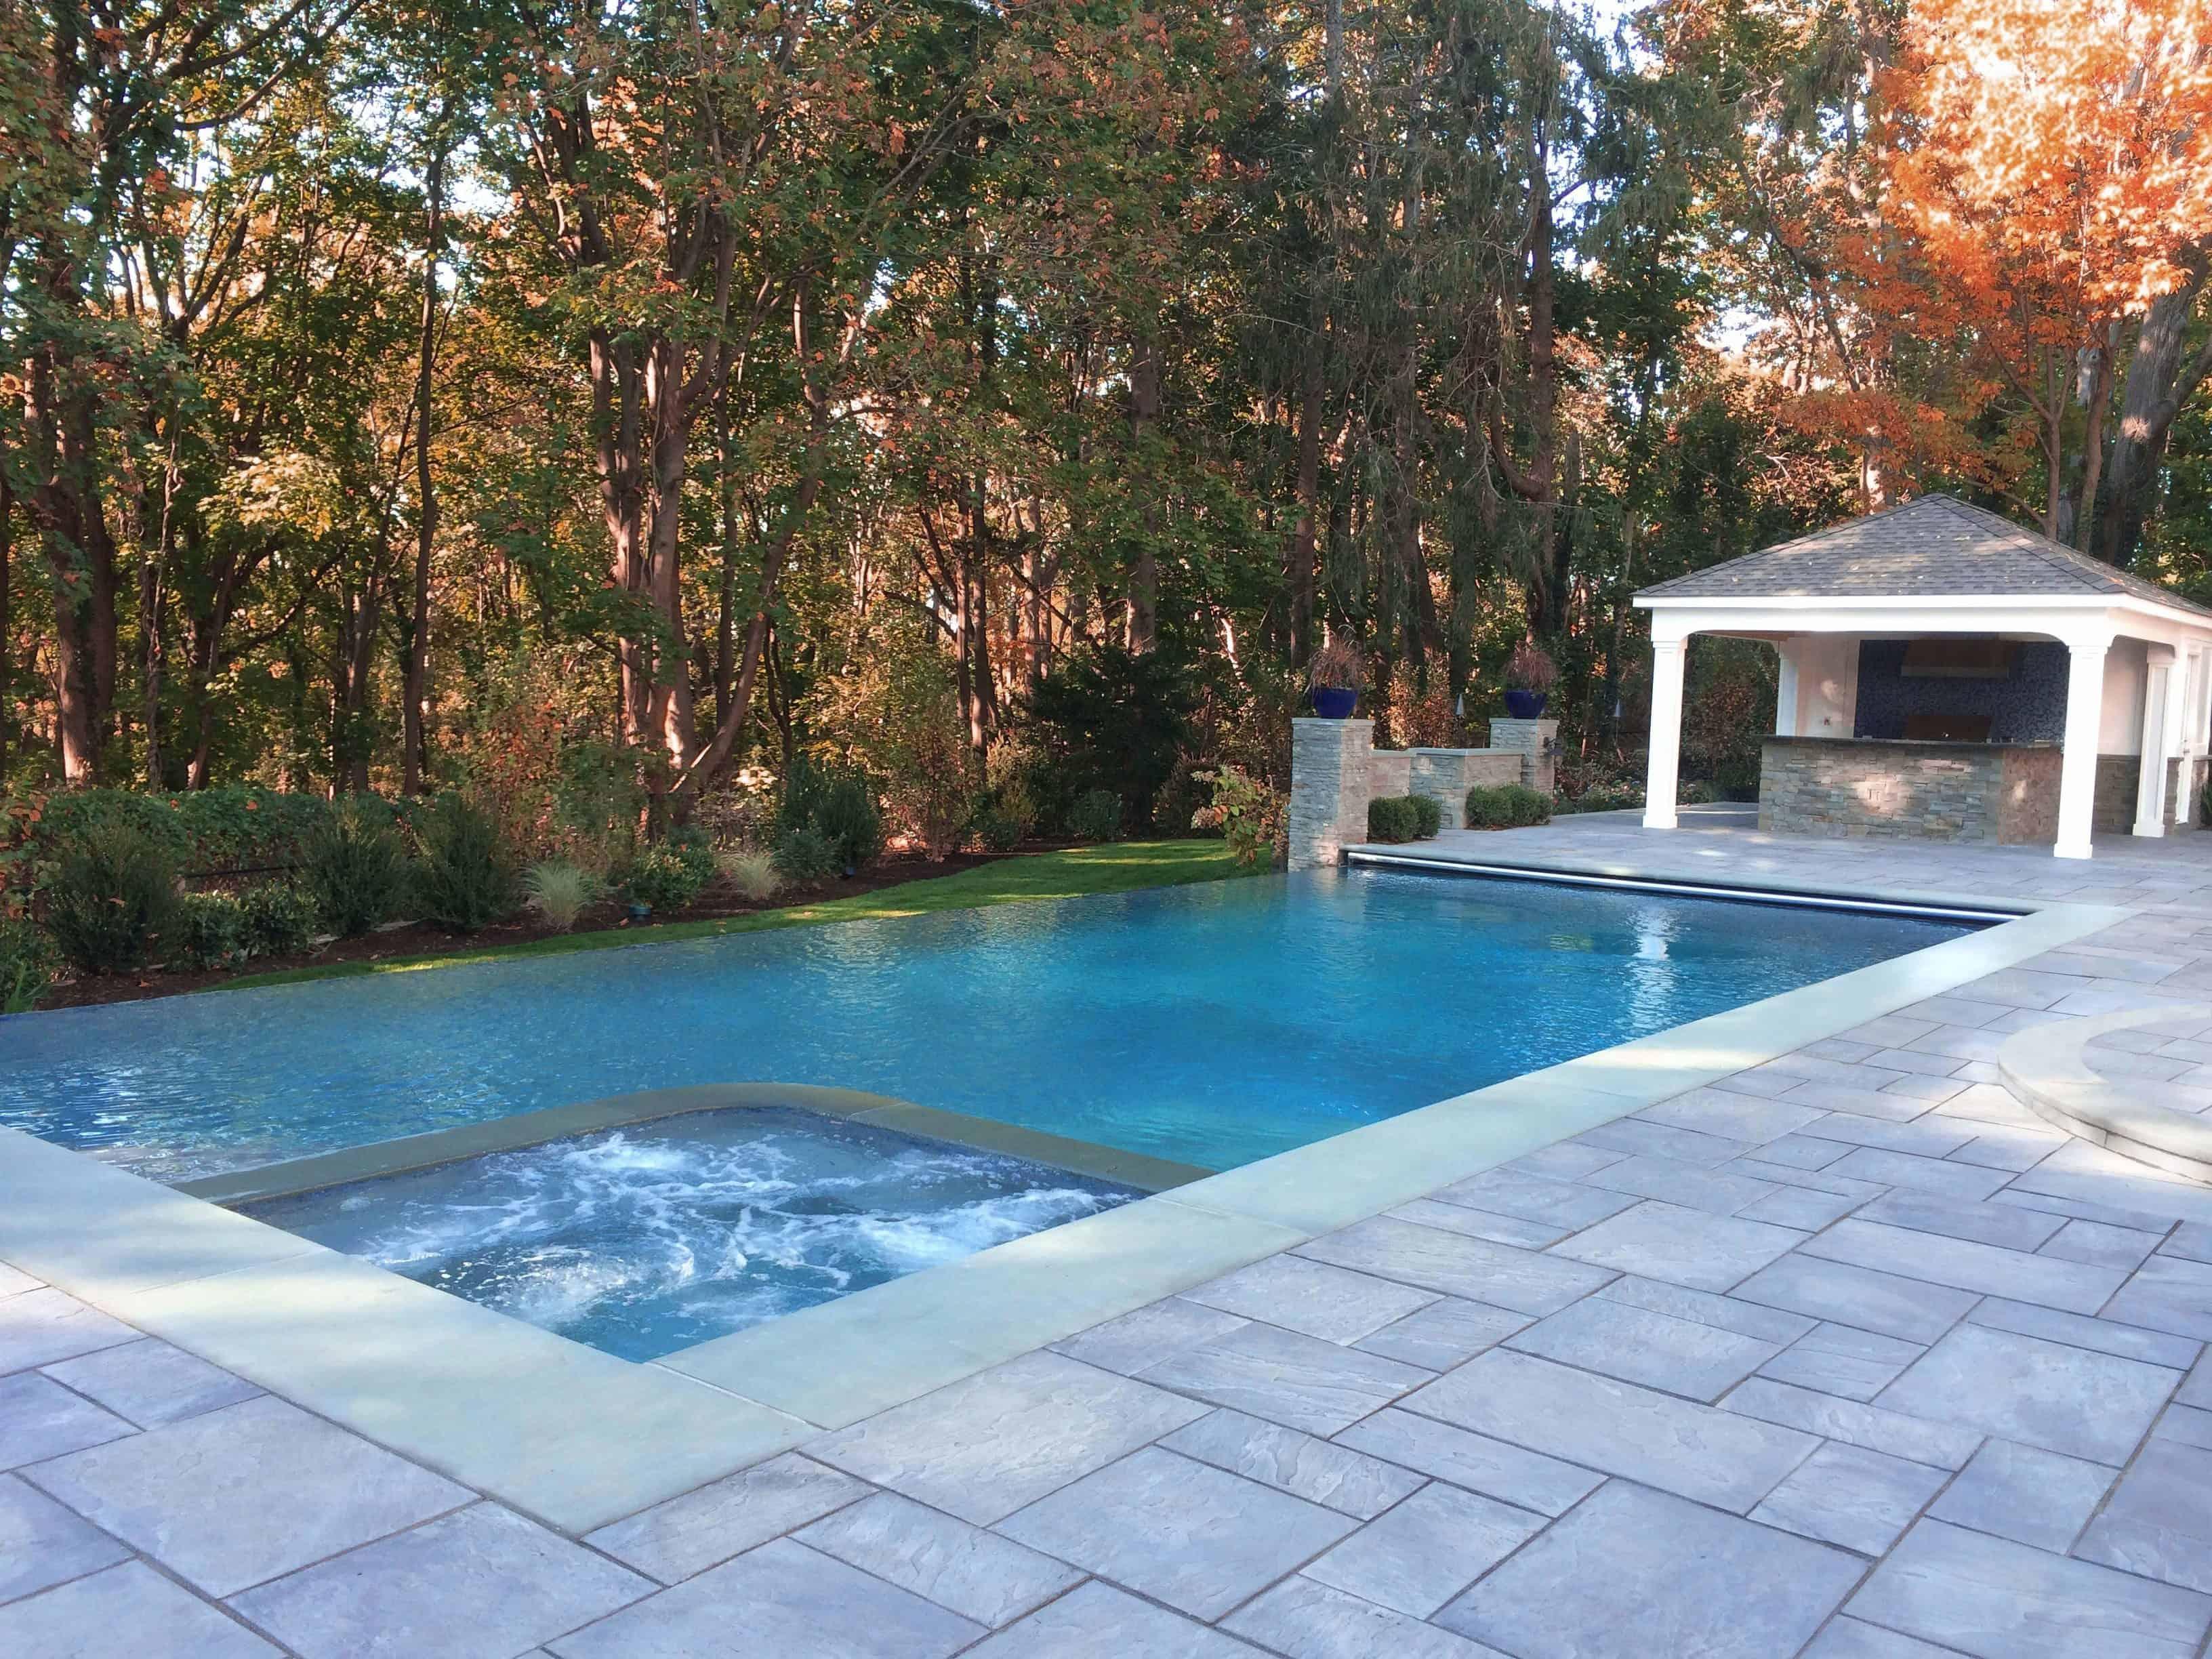 Paver Pool Patio - Cambridge Cast Stone Slab - Bluestone - Manhasset, Long Island NY